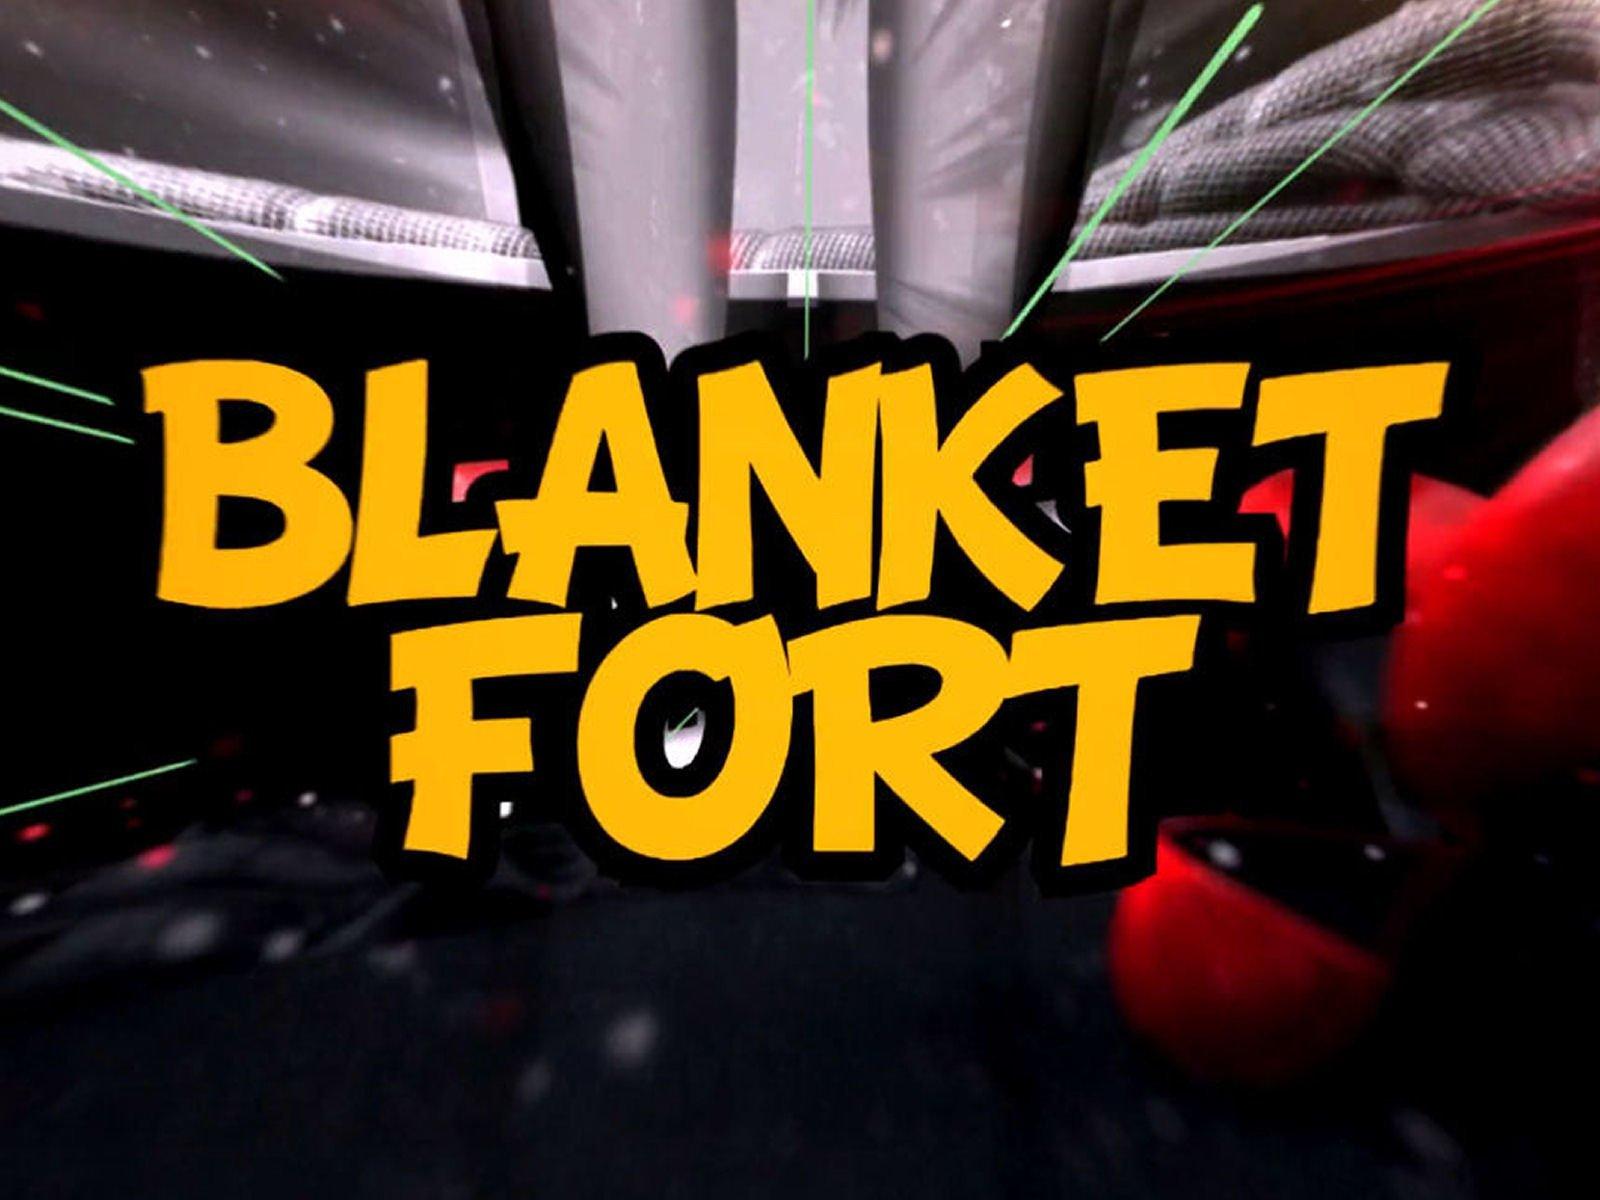 Blanket Fort - Season 1